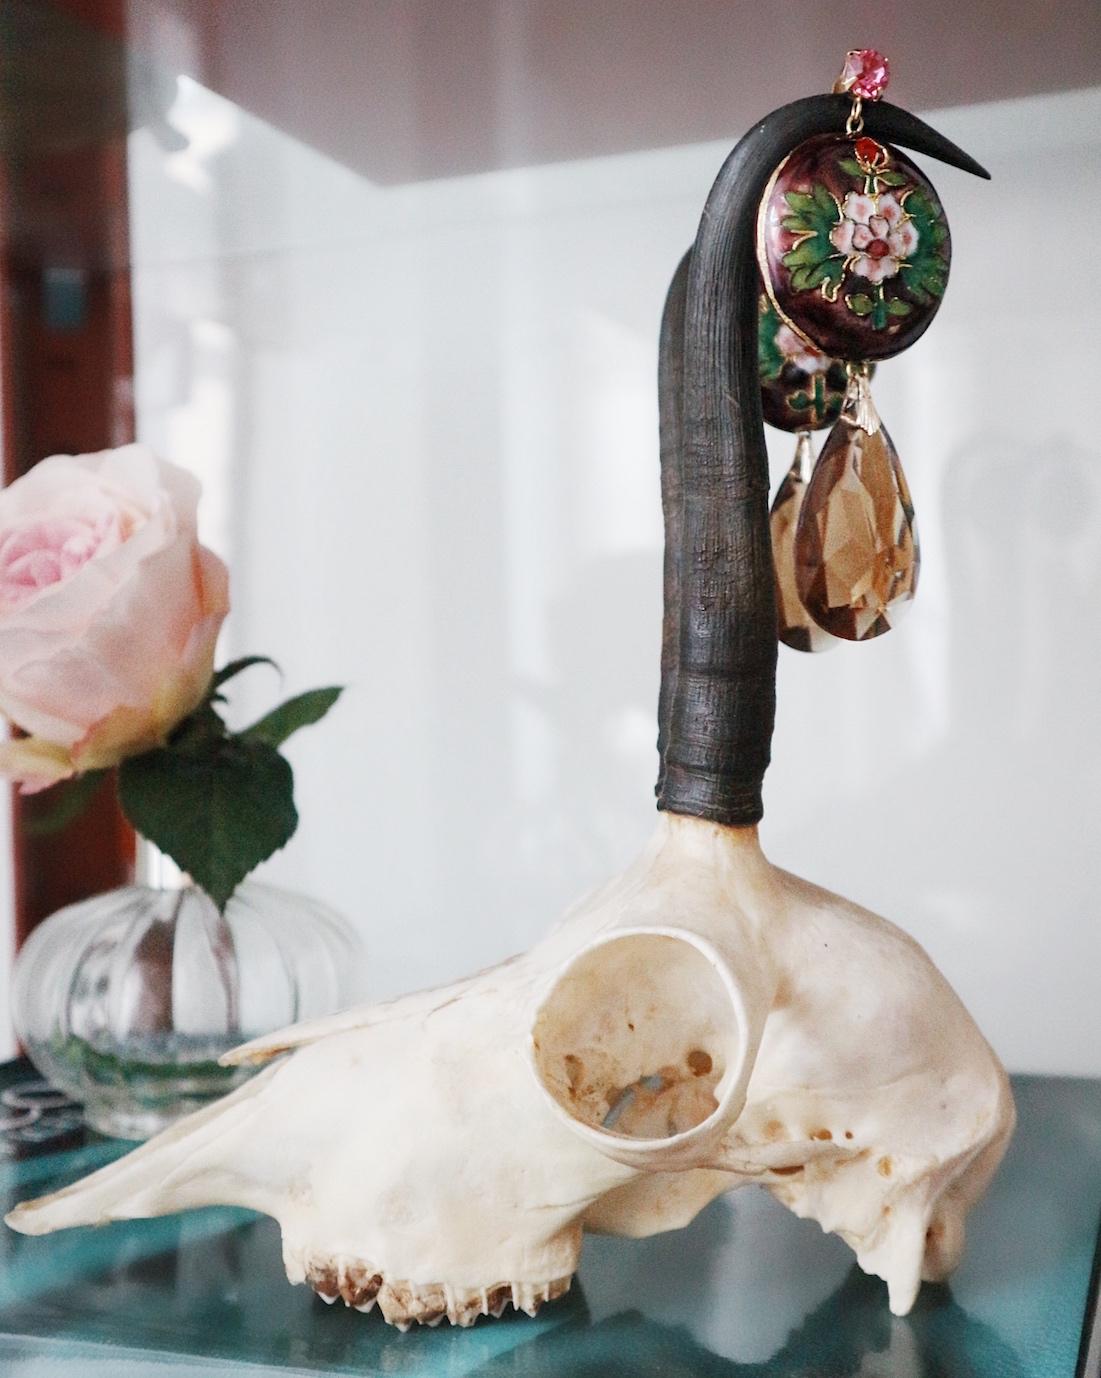 floortjeloves, je suis flore, jewelry, handmade jewelry, own design, earrings, bracelet, necklace, Florentine